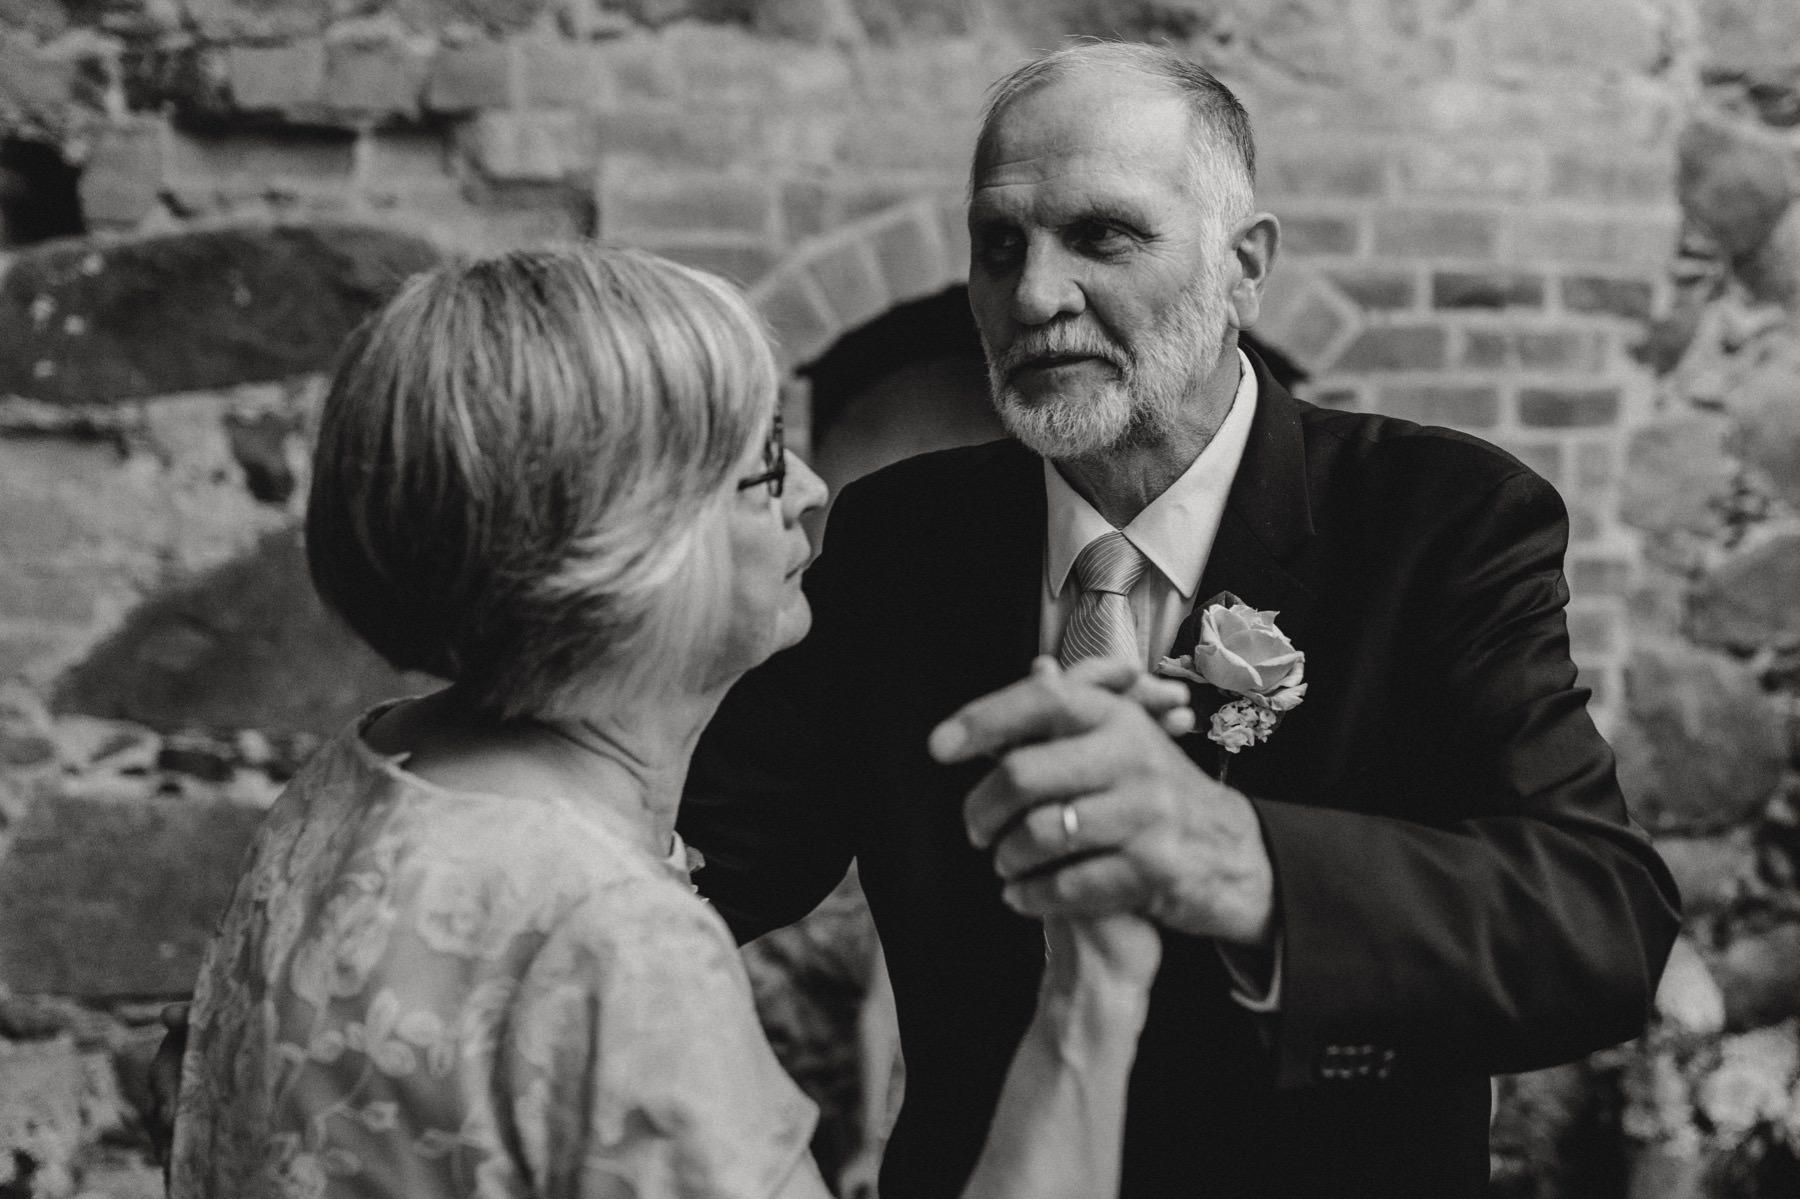 traditional wedding dances